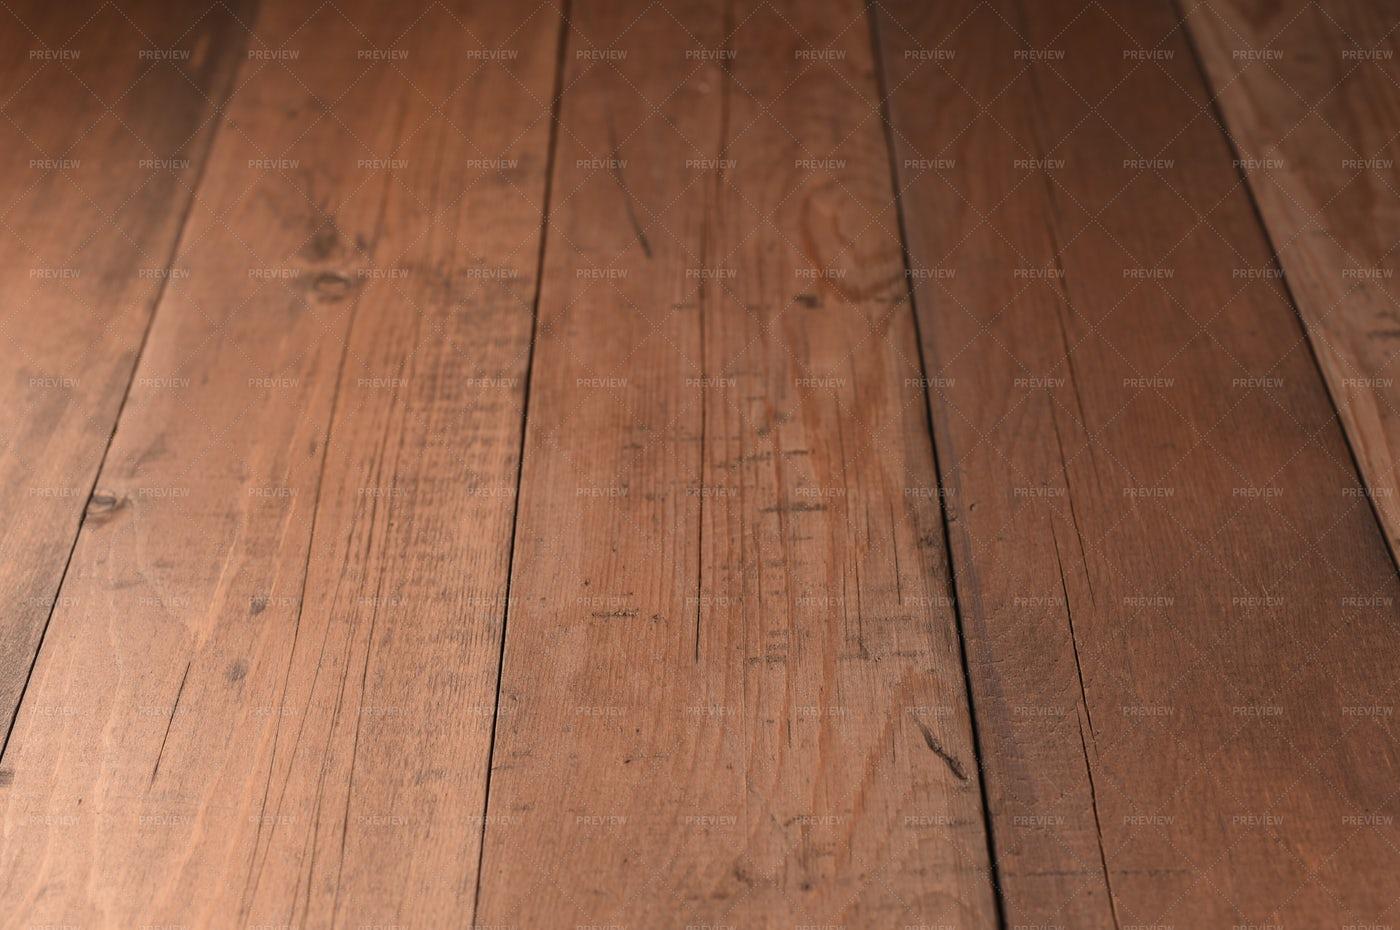 Scratched Wooden Floor Boards: Stock Photos